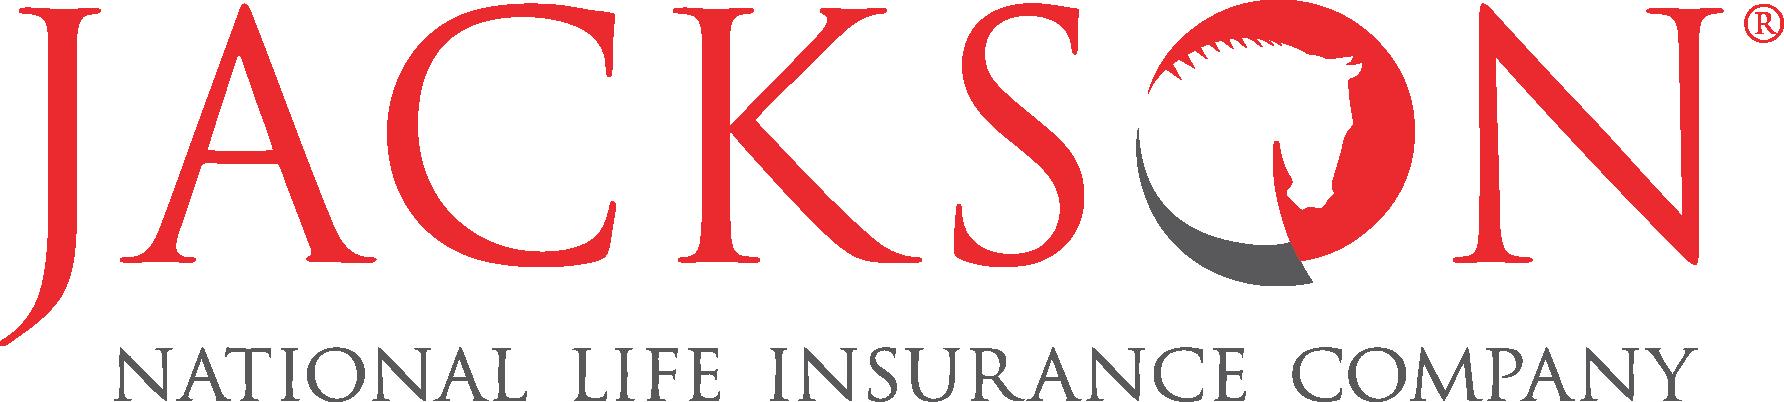 Jackson National Life Insurance Logo